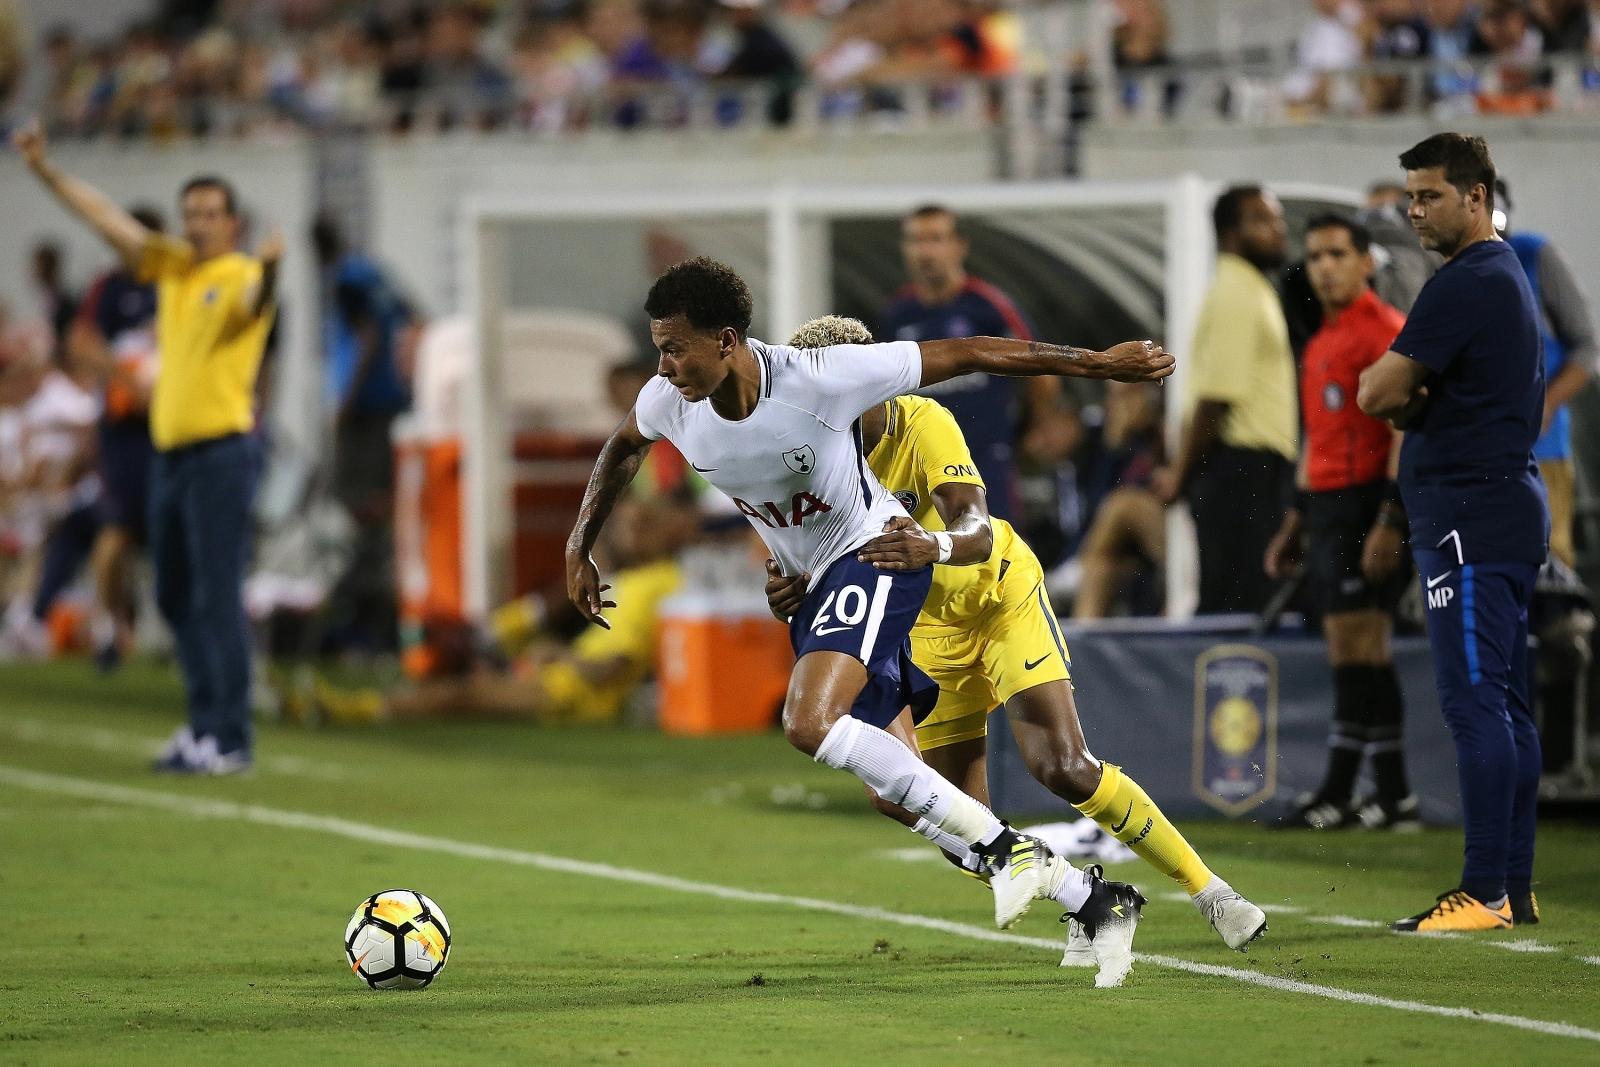 Barcelona eye signing Tottenham star Dele Alli to replace Neymar